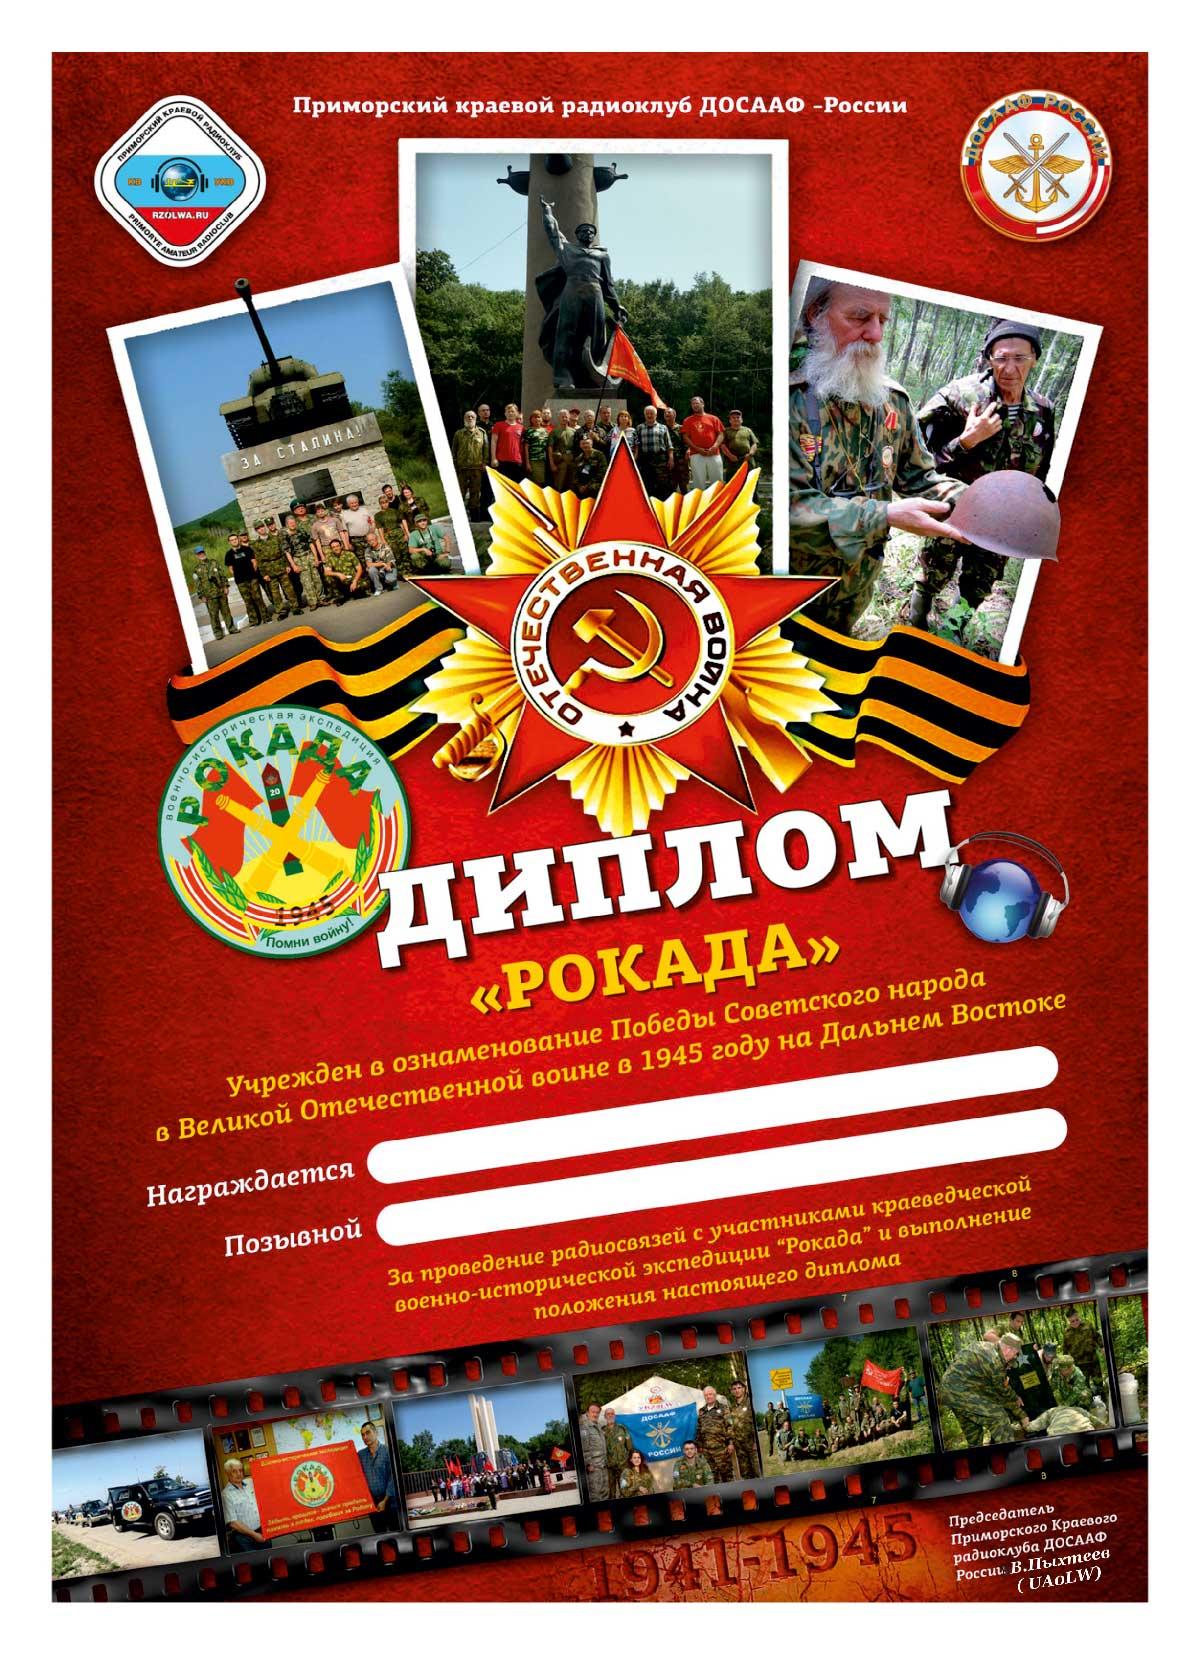 http://www.qrz.ru/awards/image/id/3125